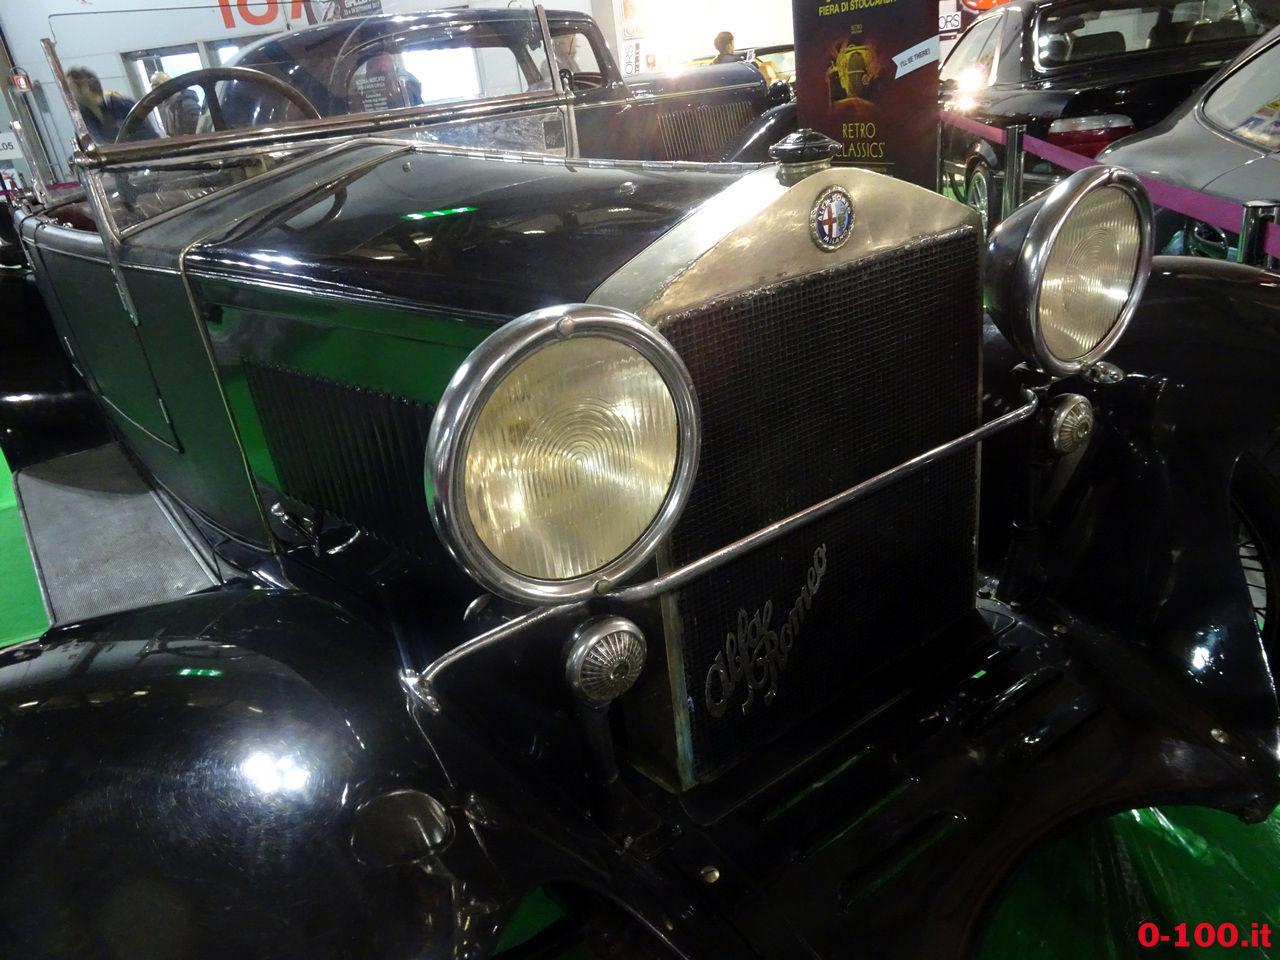 duemila-ruote-milano-autoclassica-rm-sothebys-0-100_59